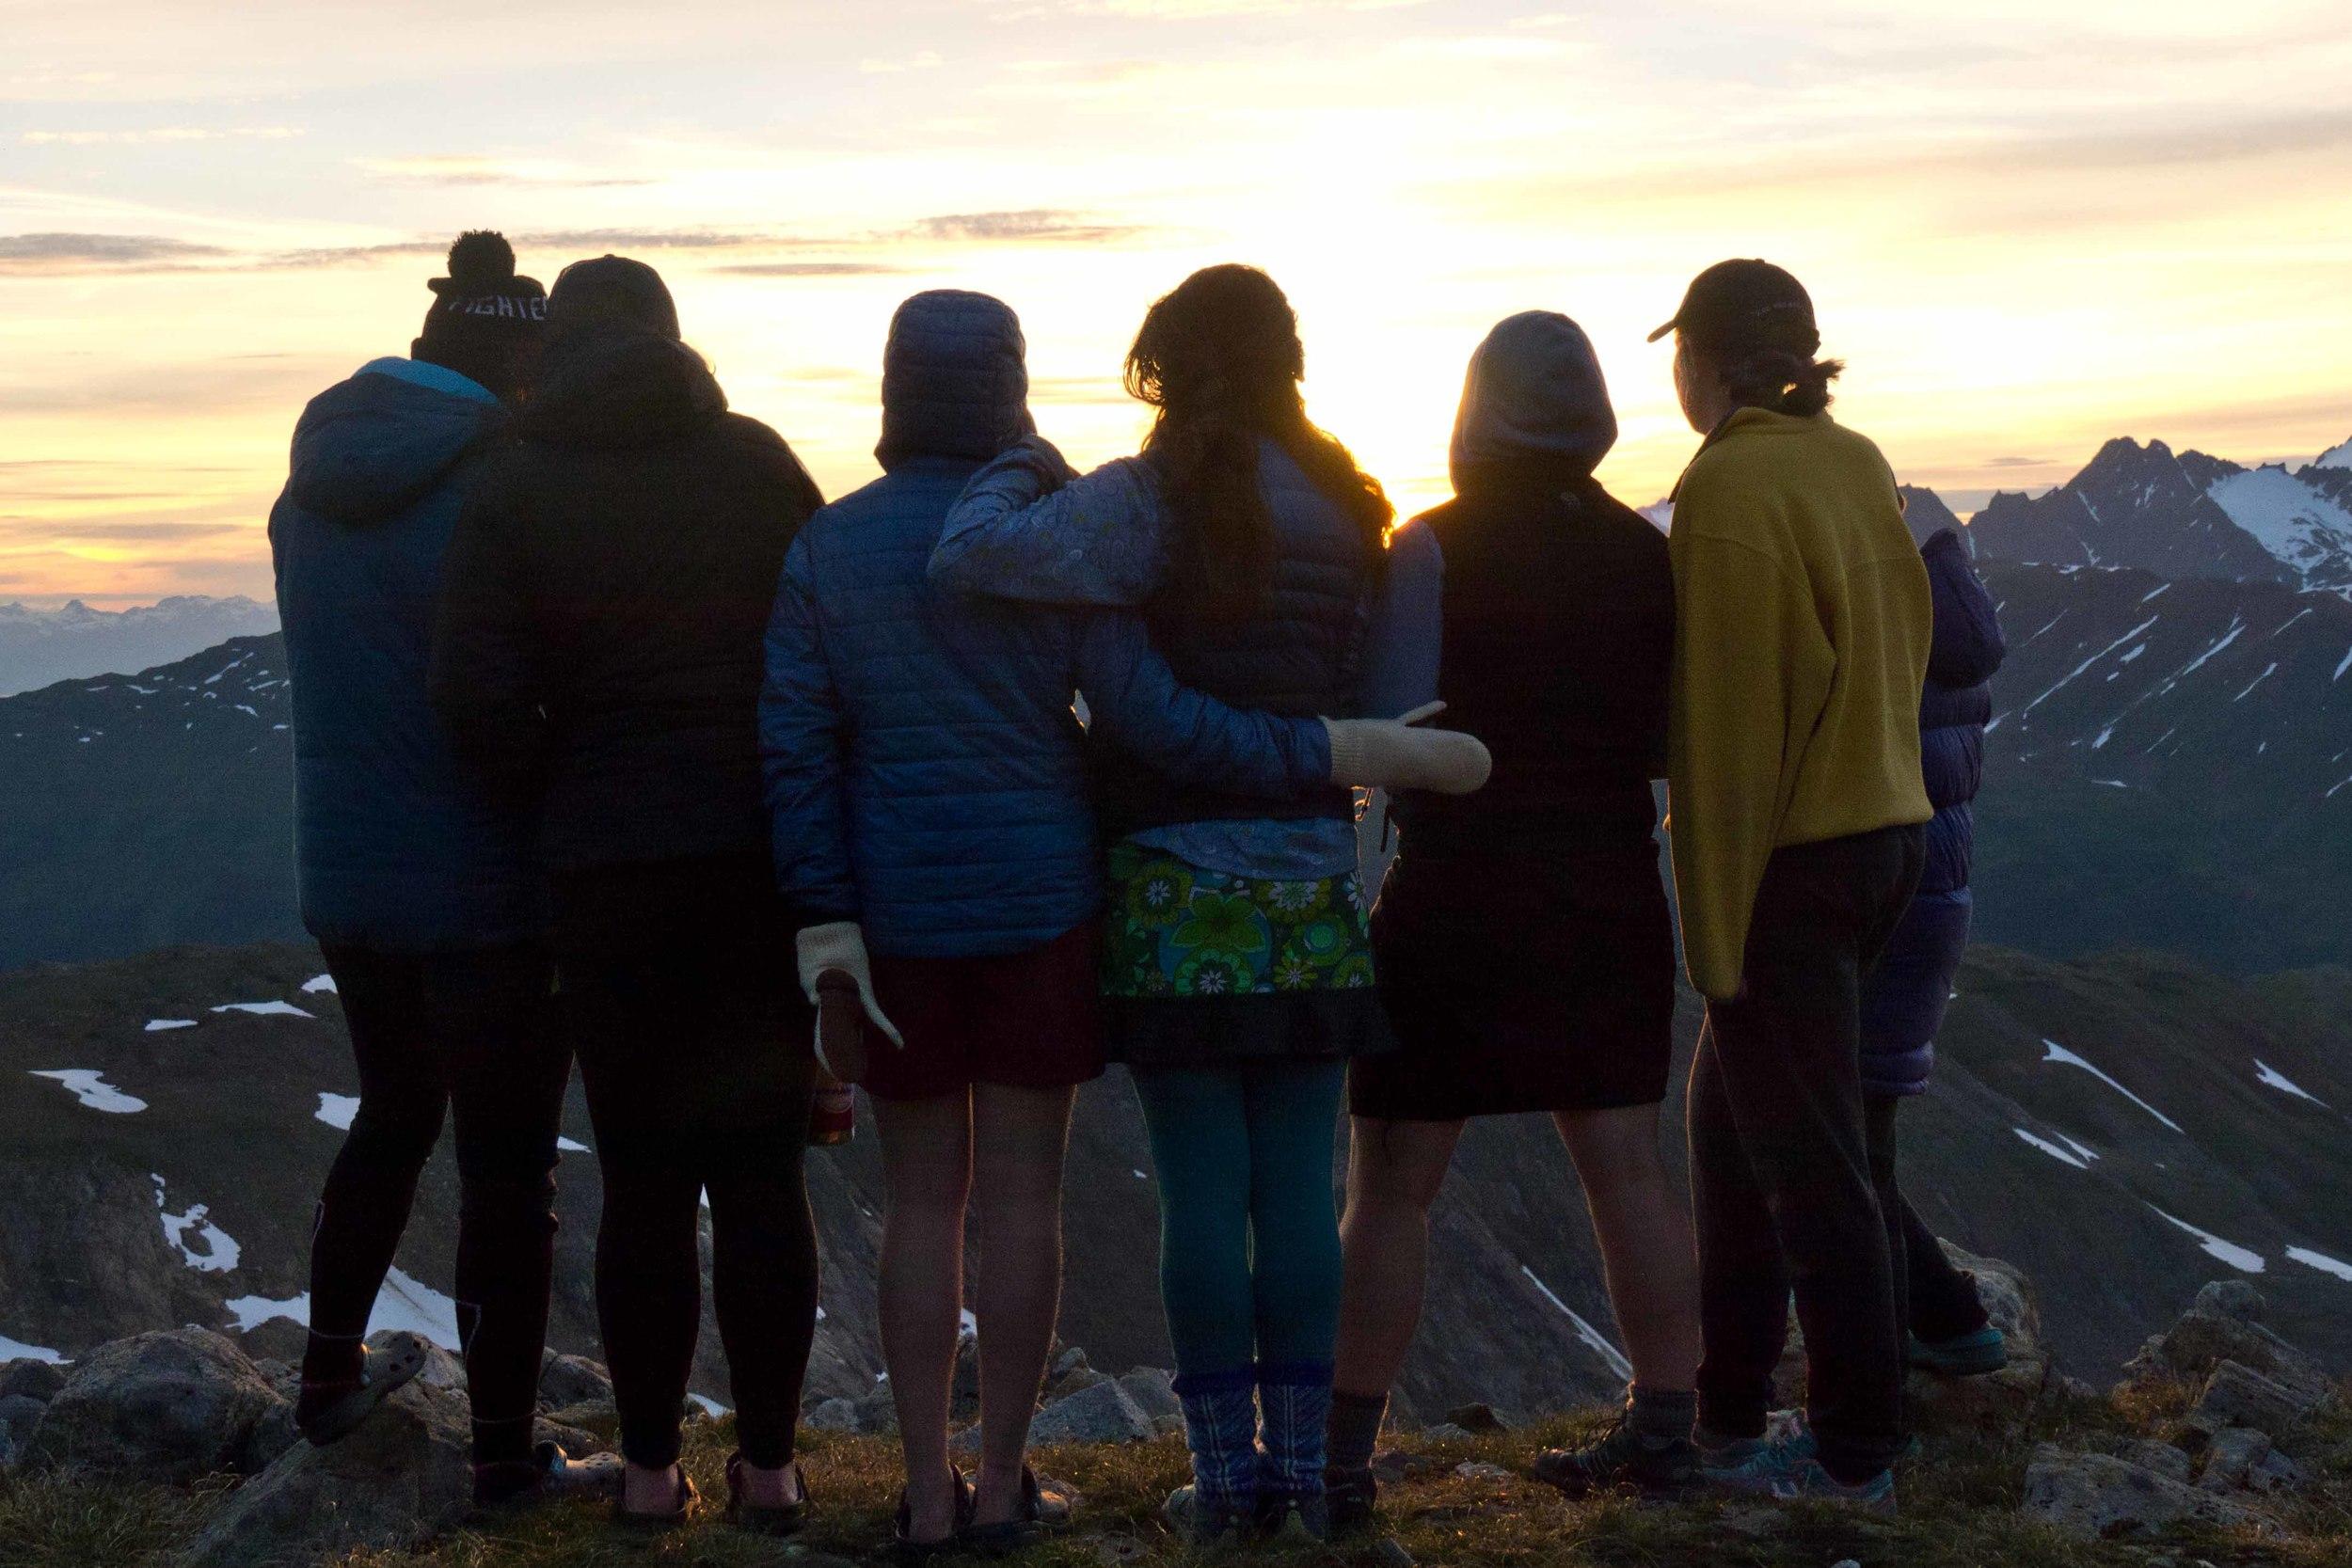 Sunset at Camp 17. Photo by Matt Beedle.